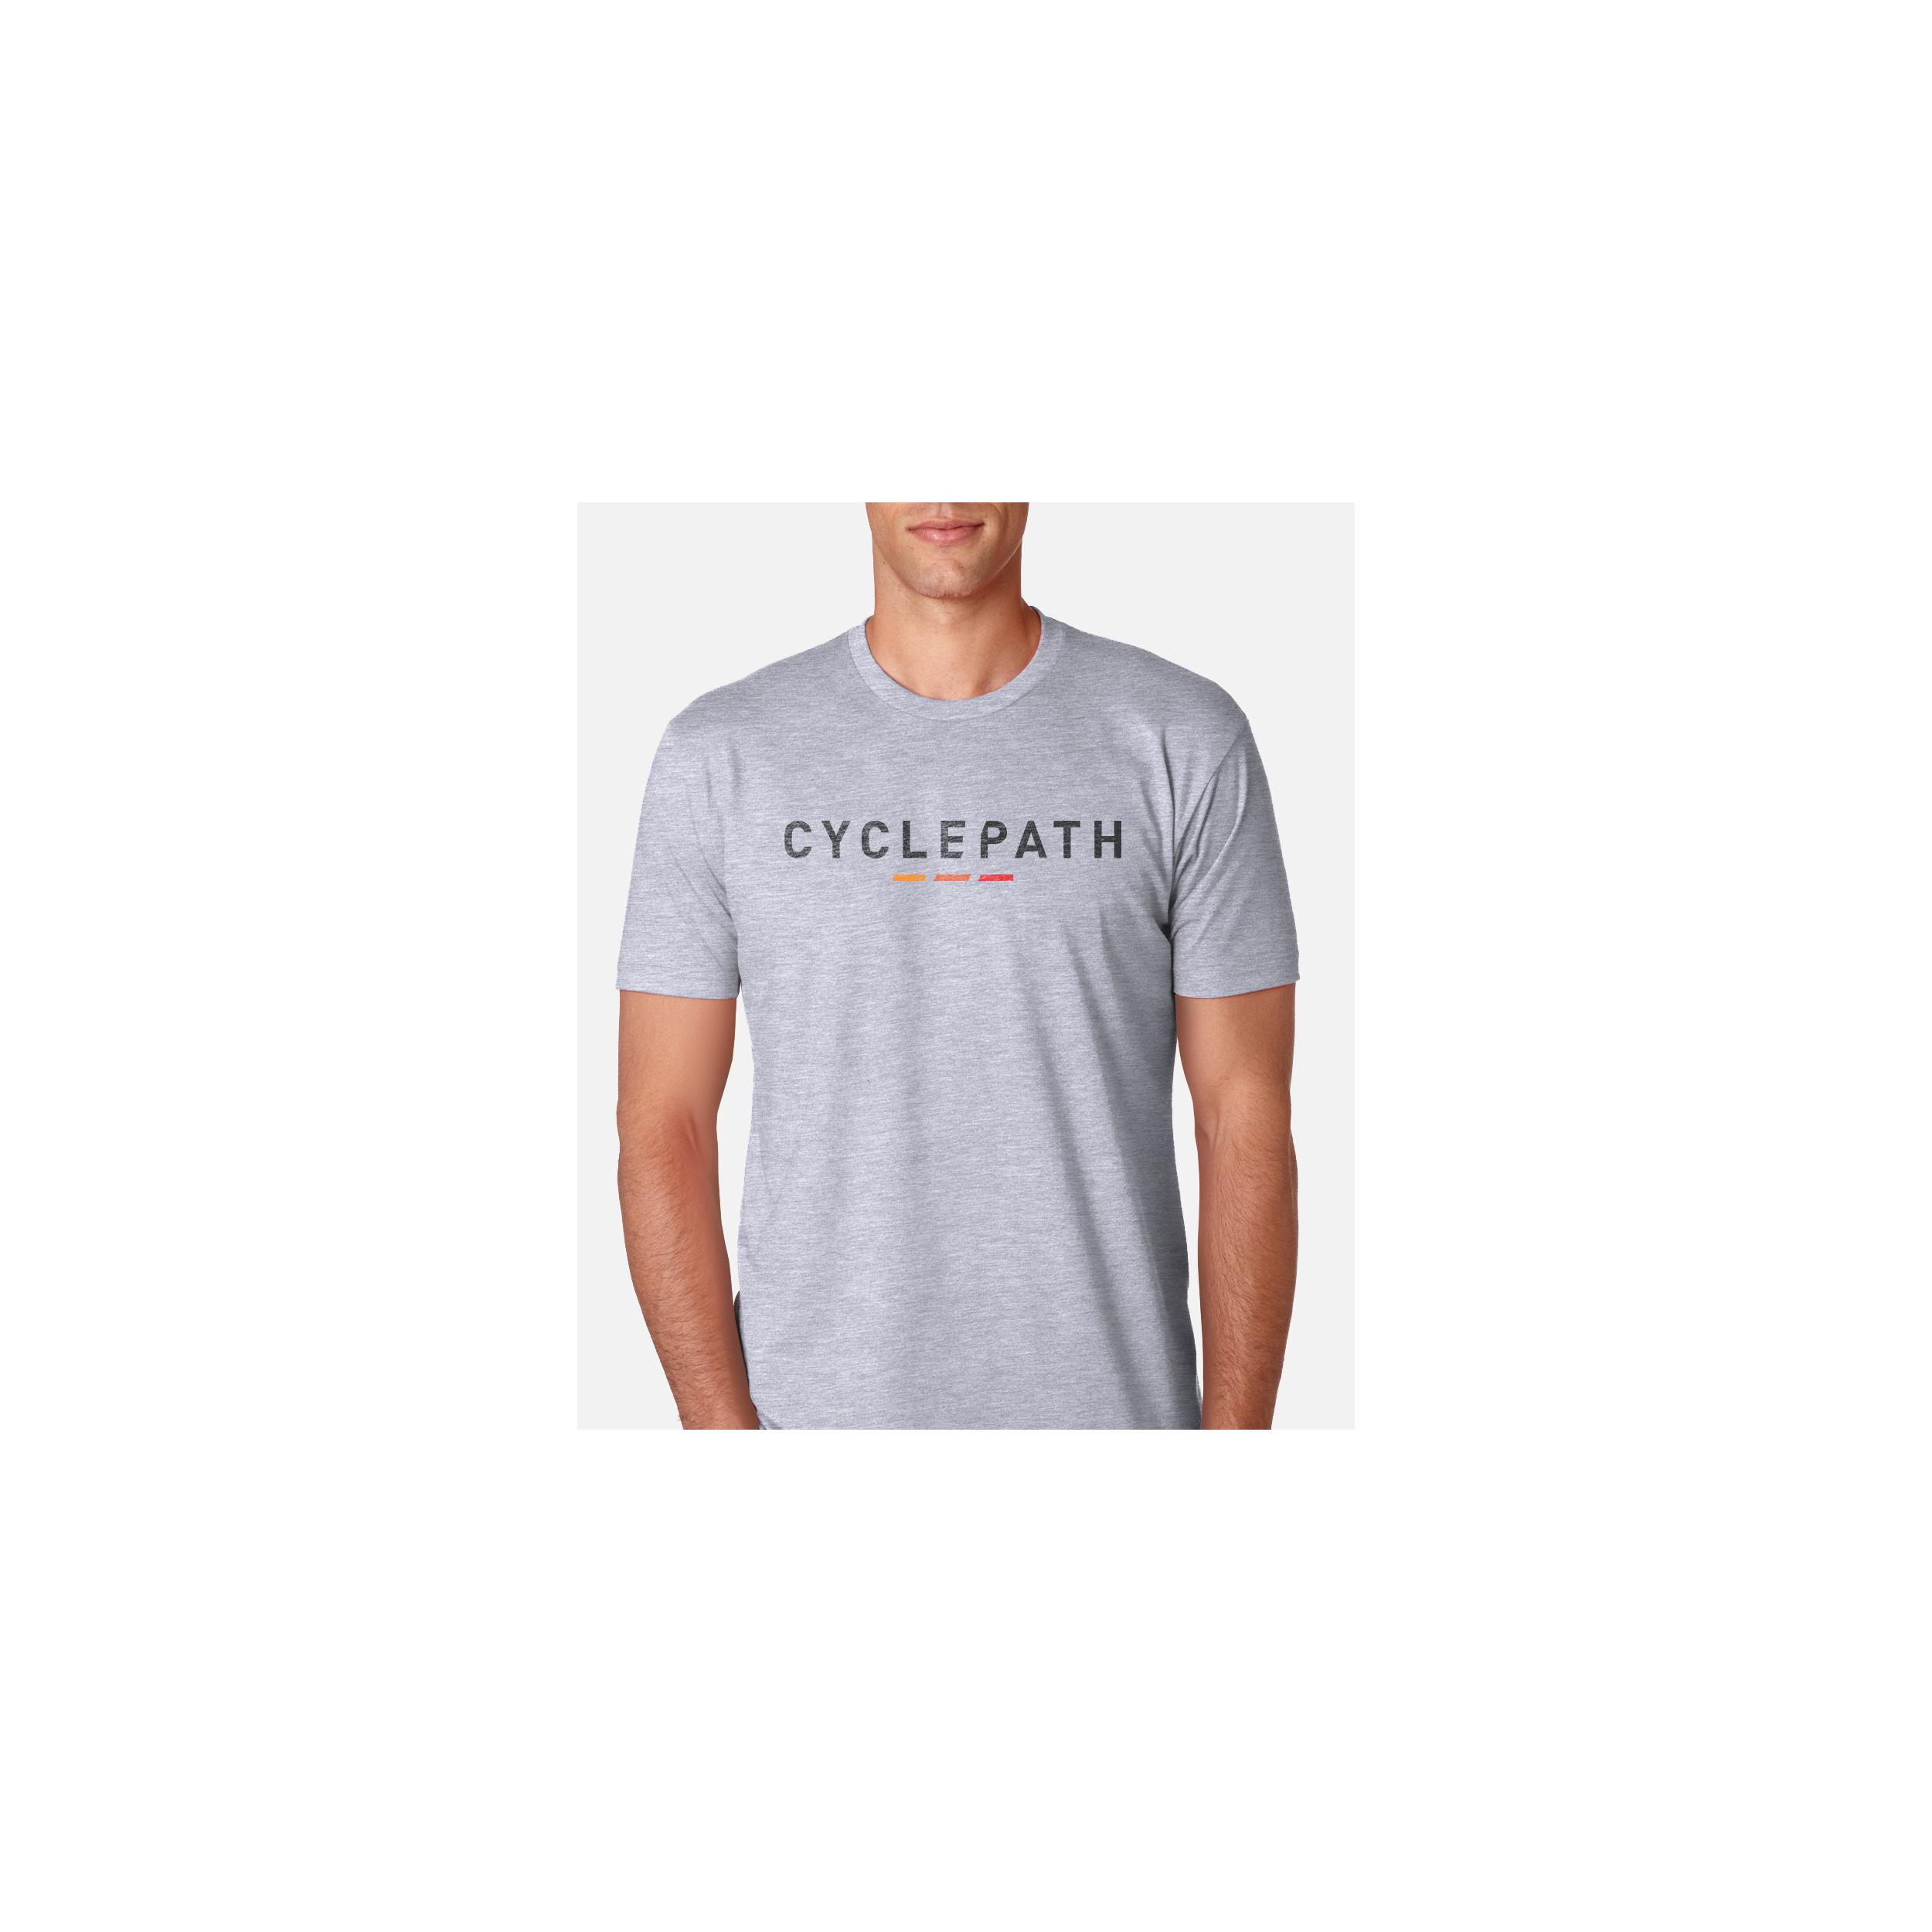 Cyclepath-Shirt.png